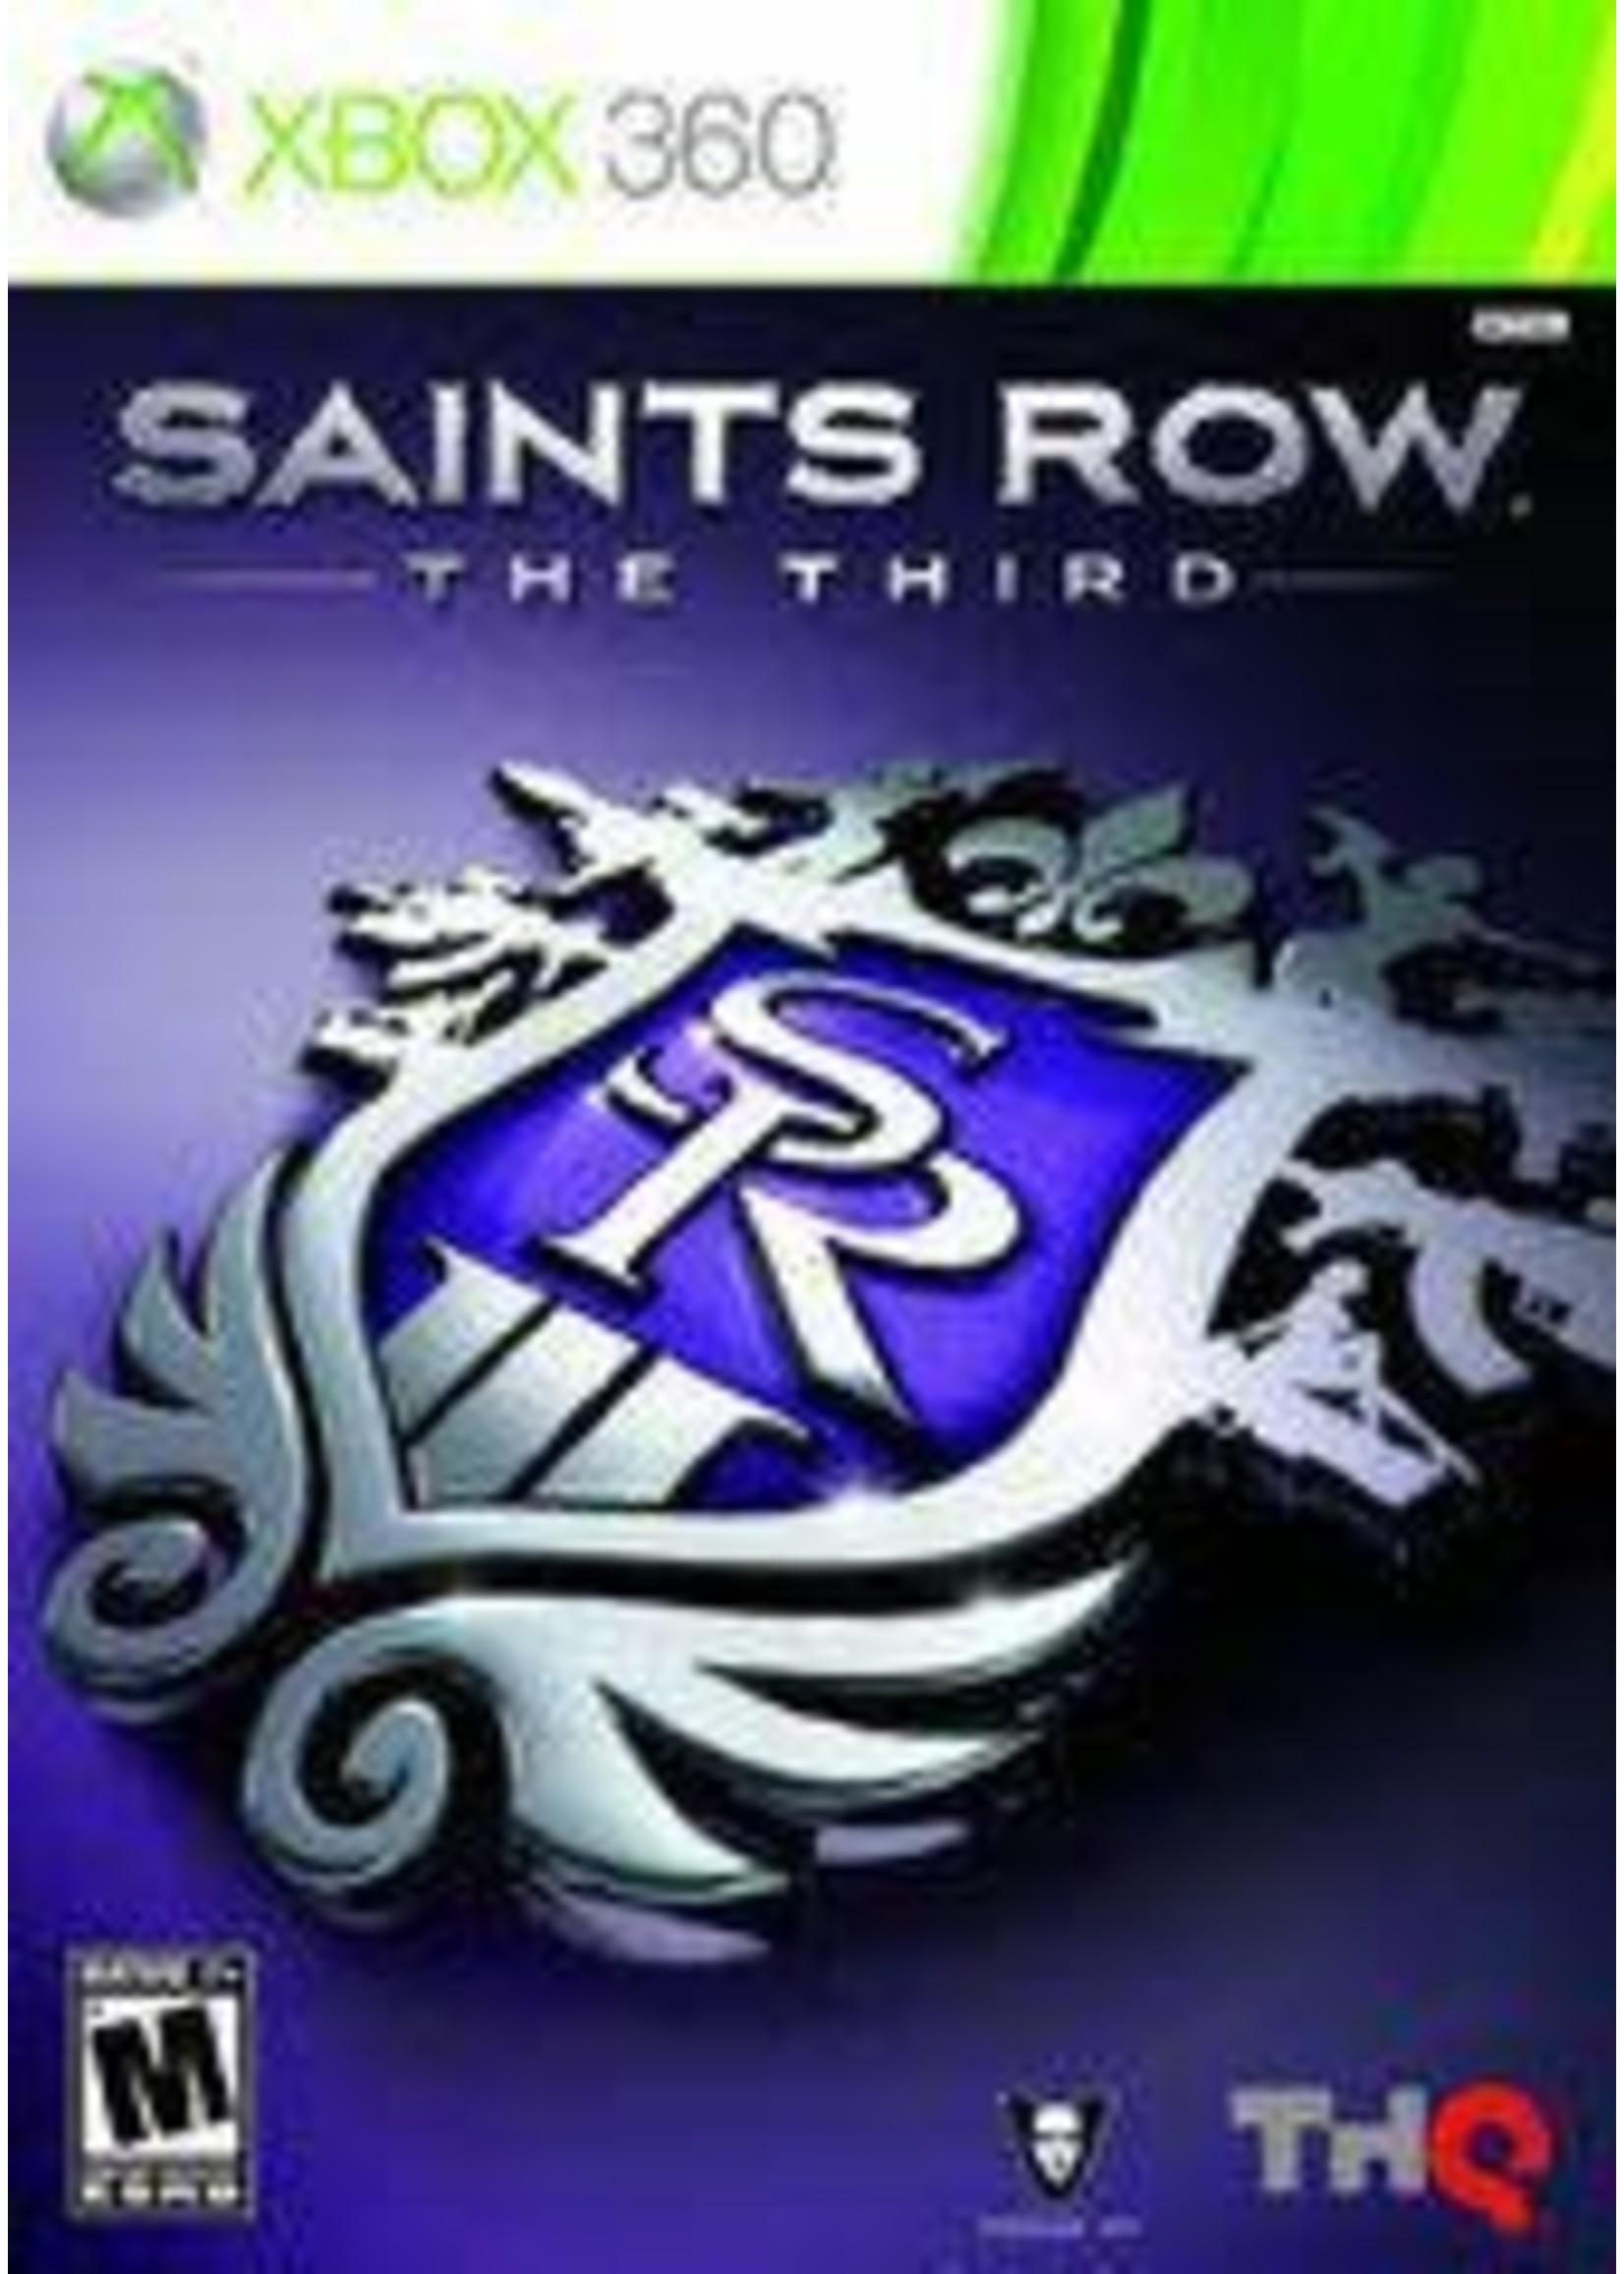 Saints Row: The Third Xbox 360